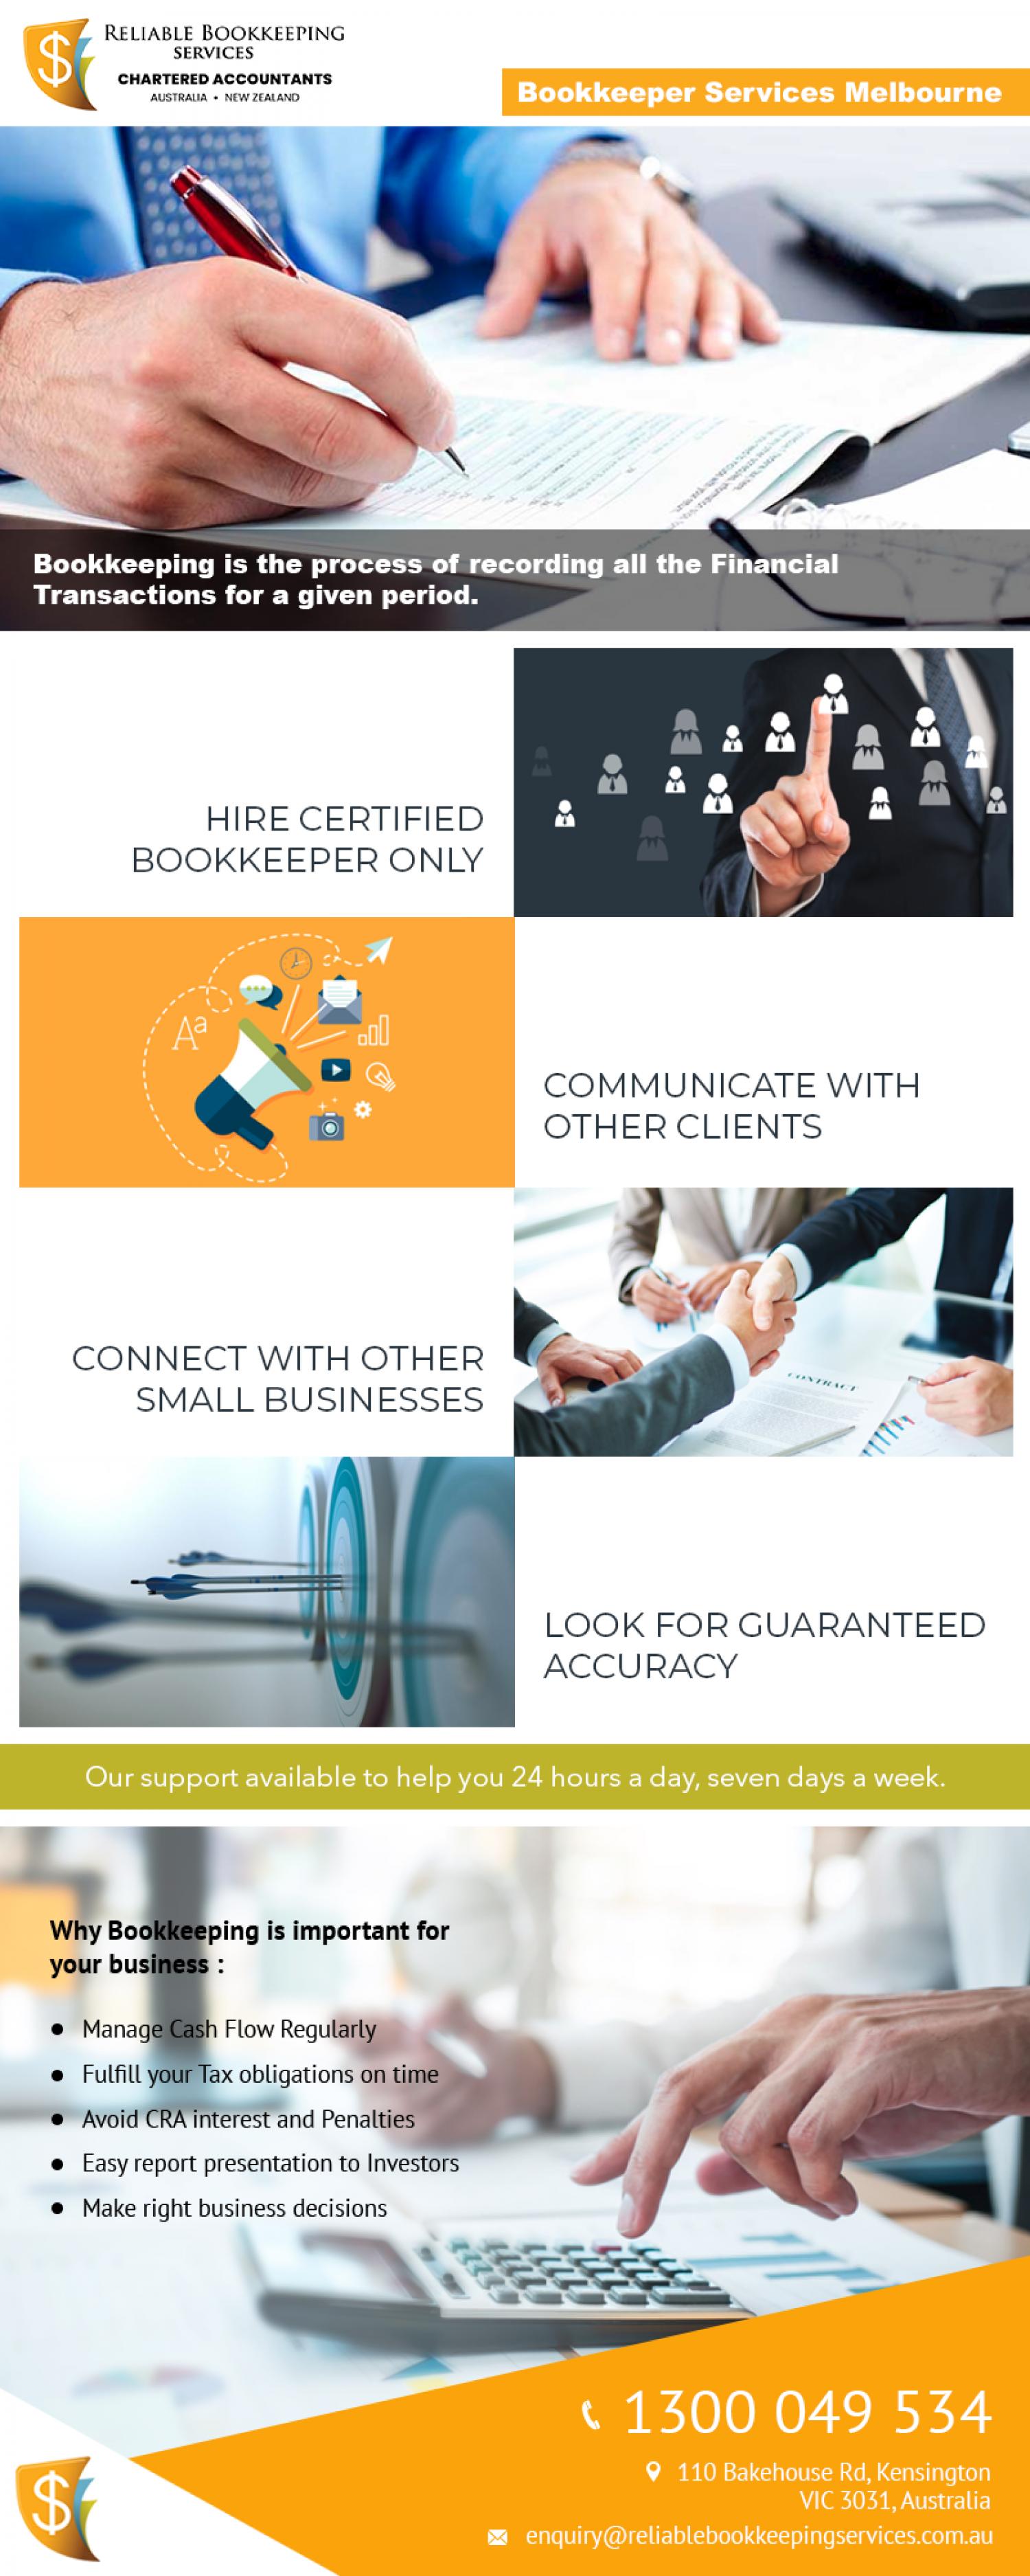 bookkeeper-services-melbourne